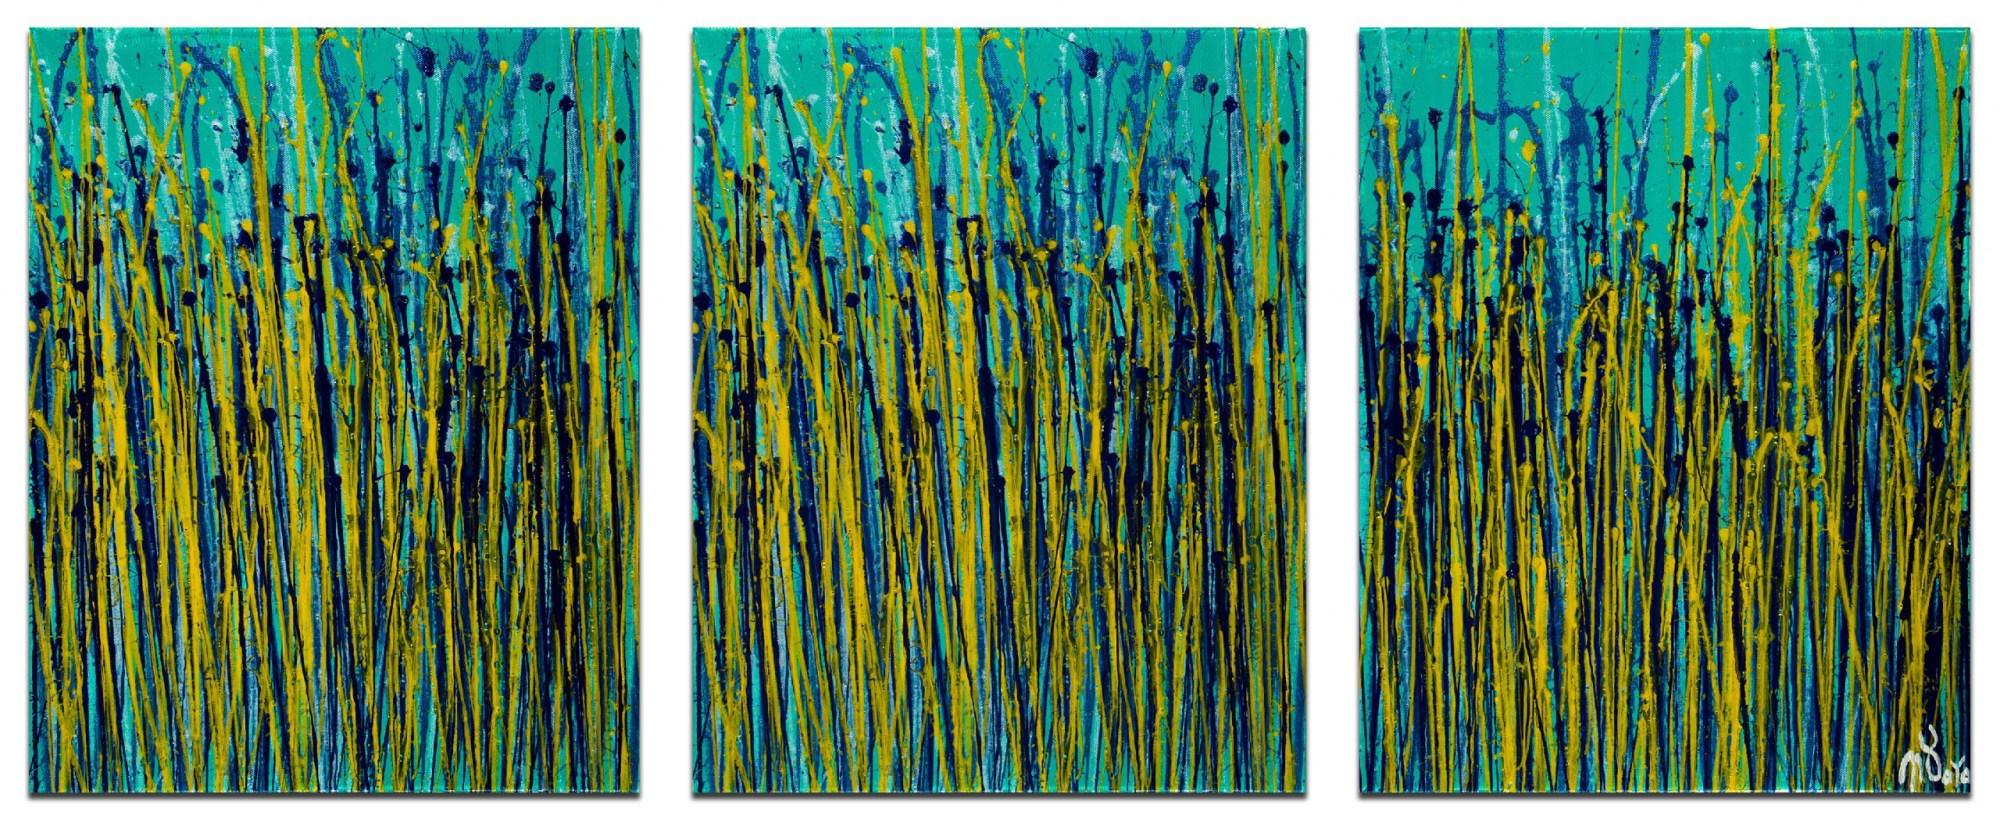 Vernal Garden (With Green) (2020) / Triptych by Nestor Toro